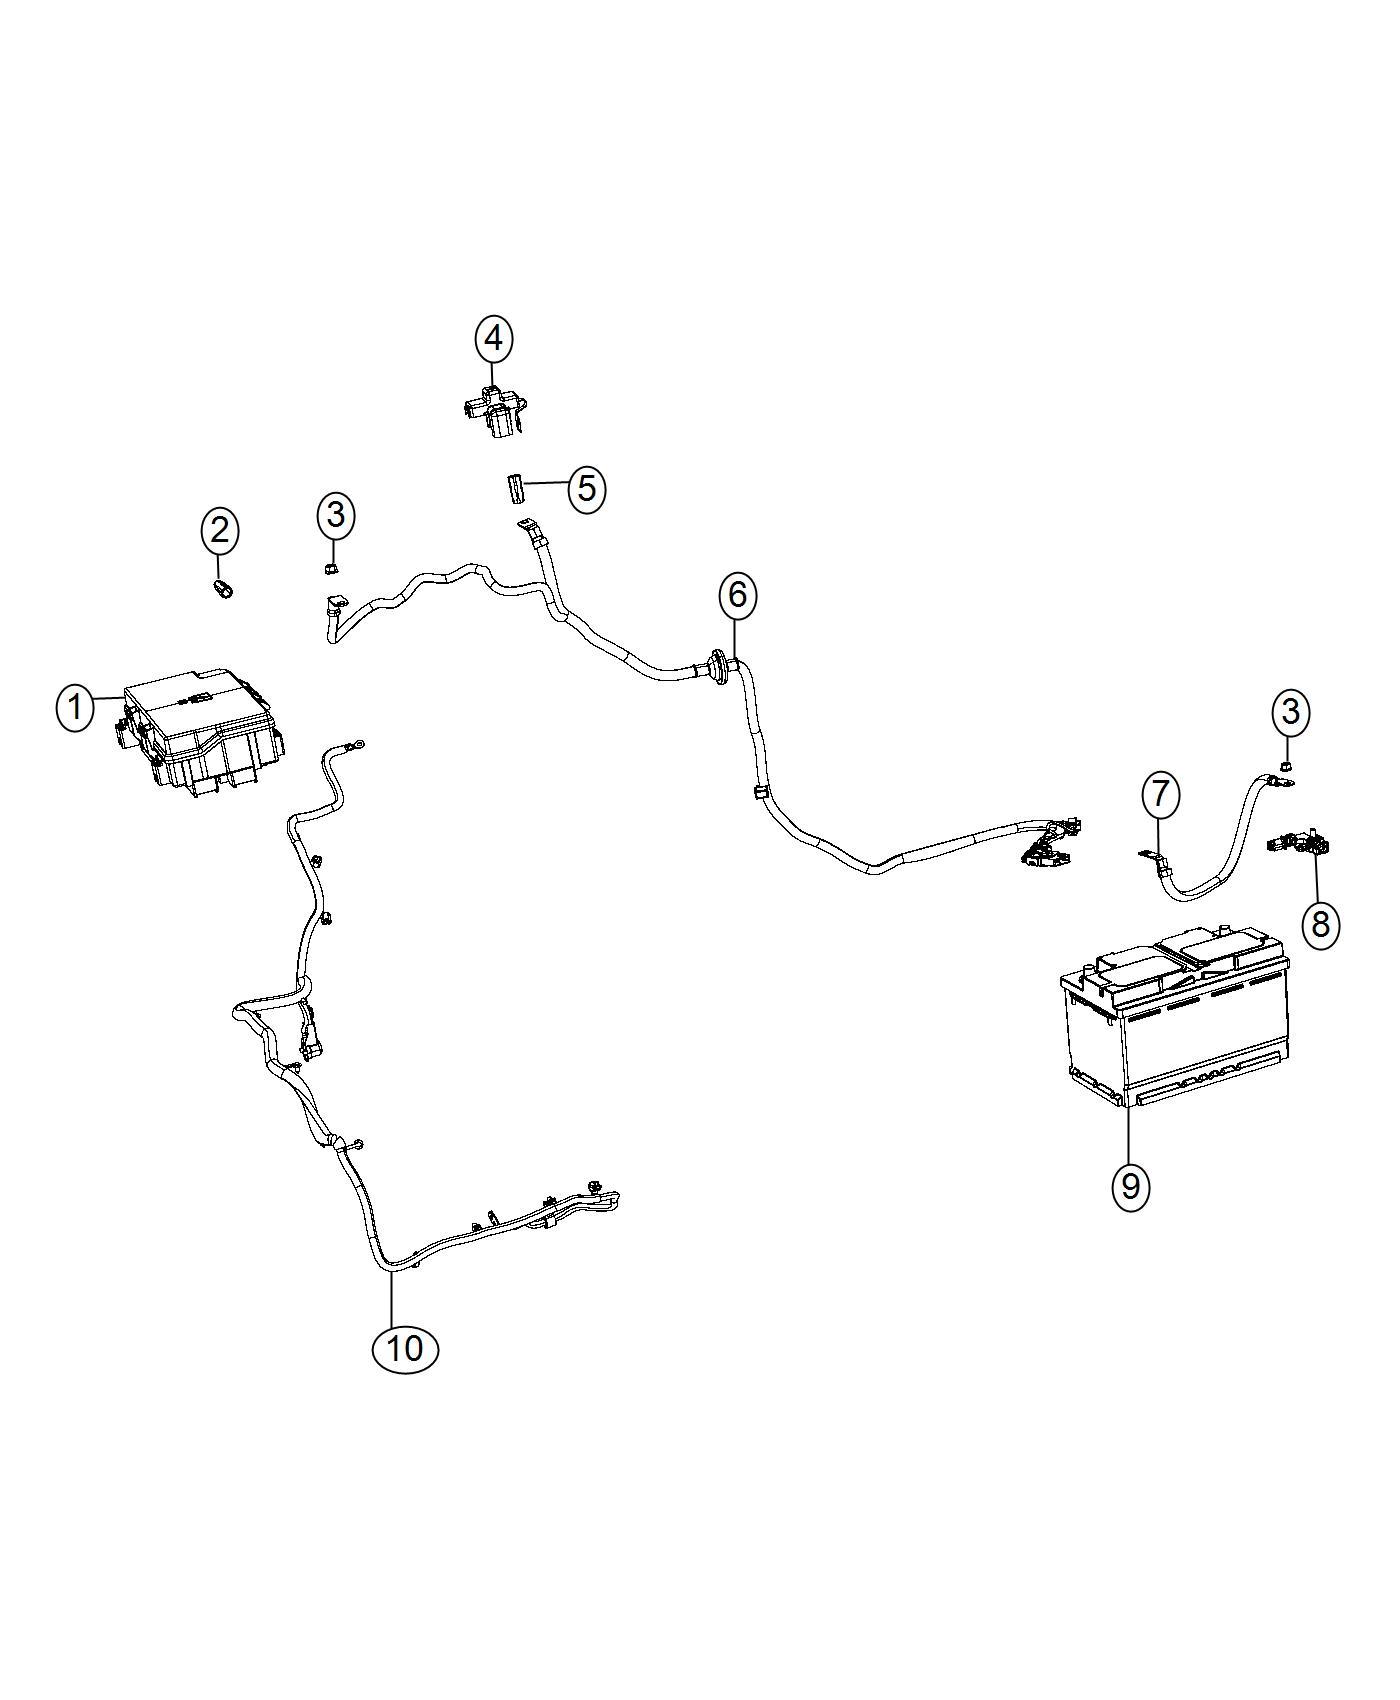 2017 Jeep Grand Cherokee Wiring  Battery Positive  Amp  Alternator  System